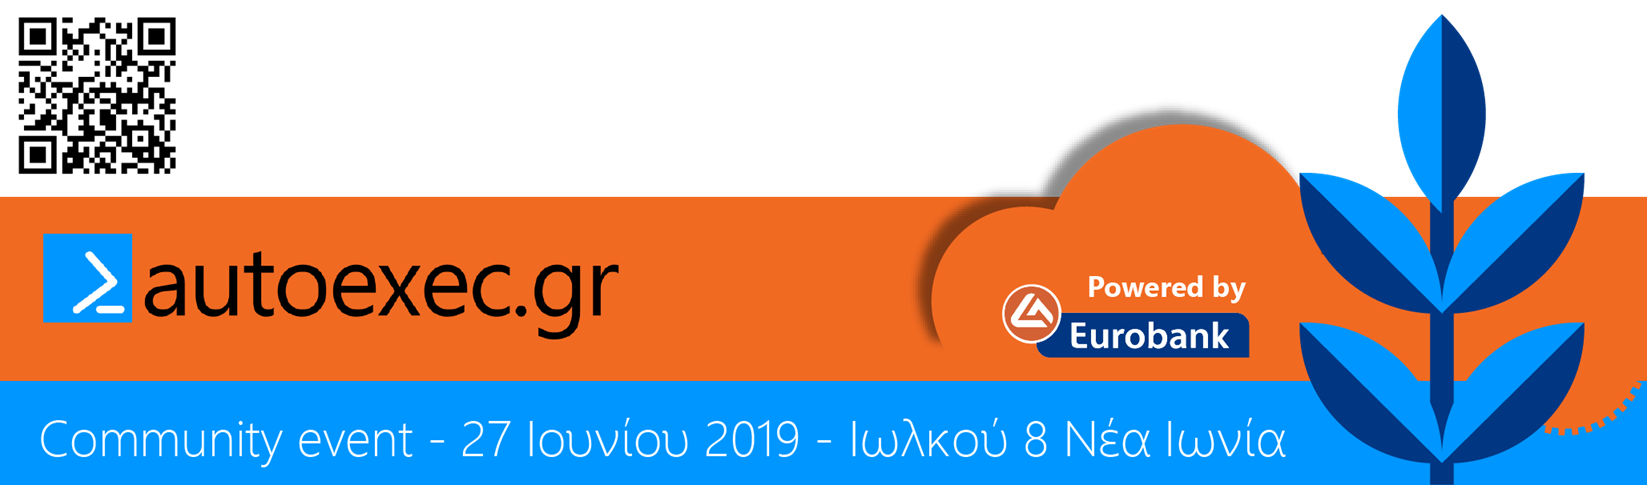 autoexec-evebt-june-2019-header